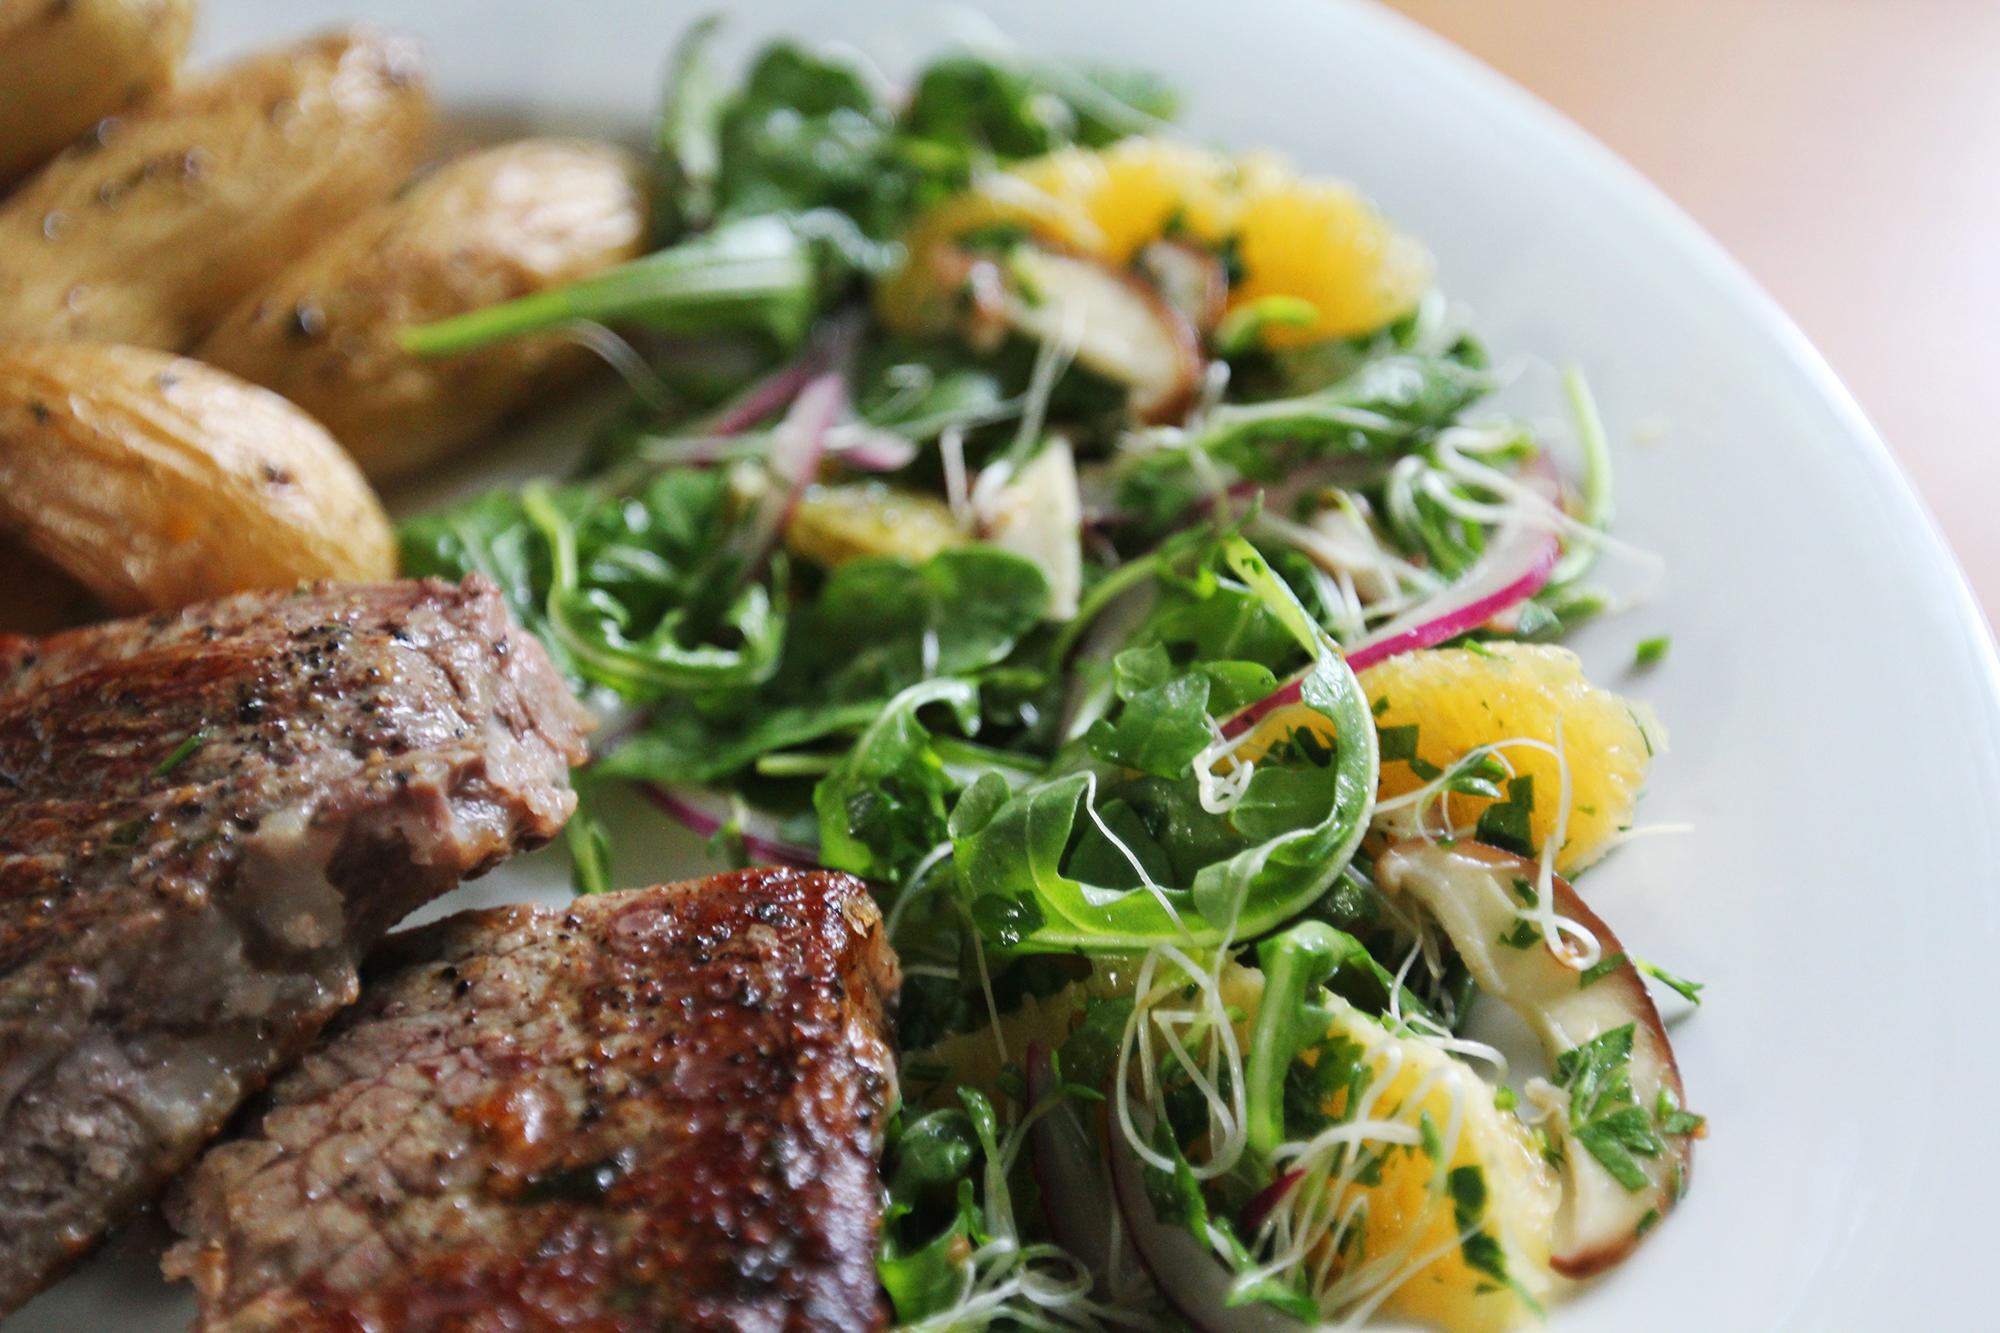 jo-torrijos-states-of-reverie-recipes-seared-rib-eye-roasted-fingerling-potatoes-orange-shiitake-salad-1.jpg